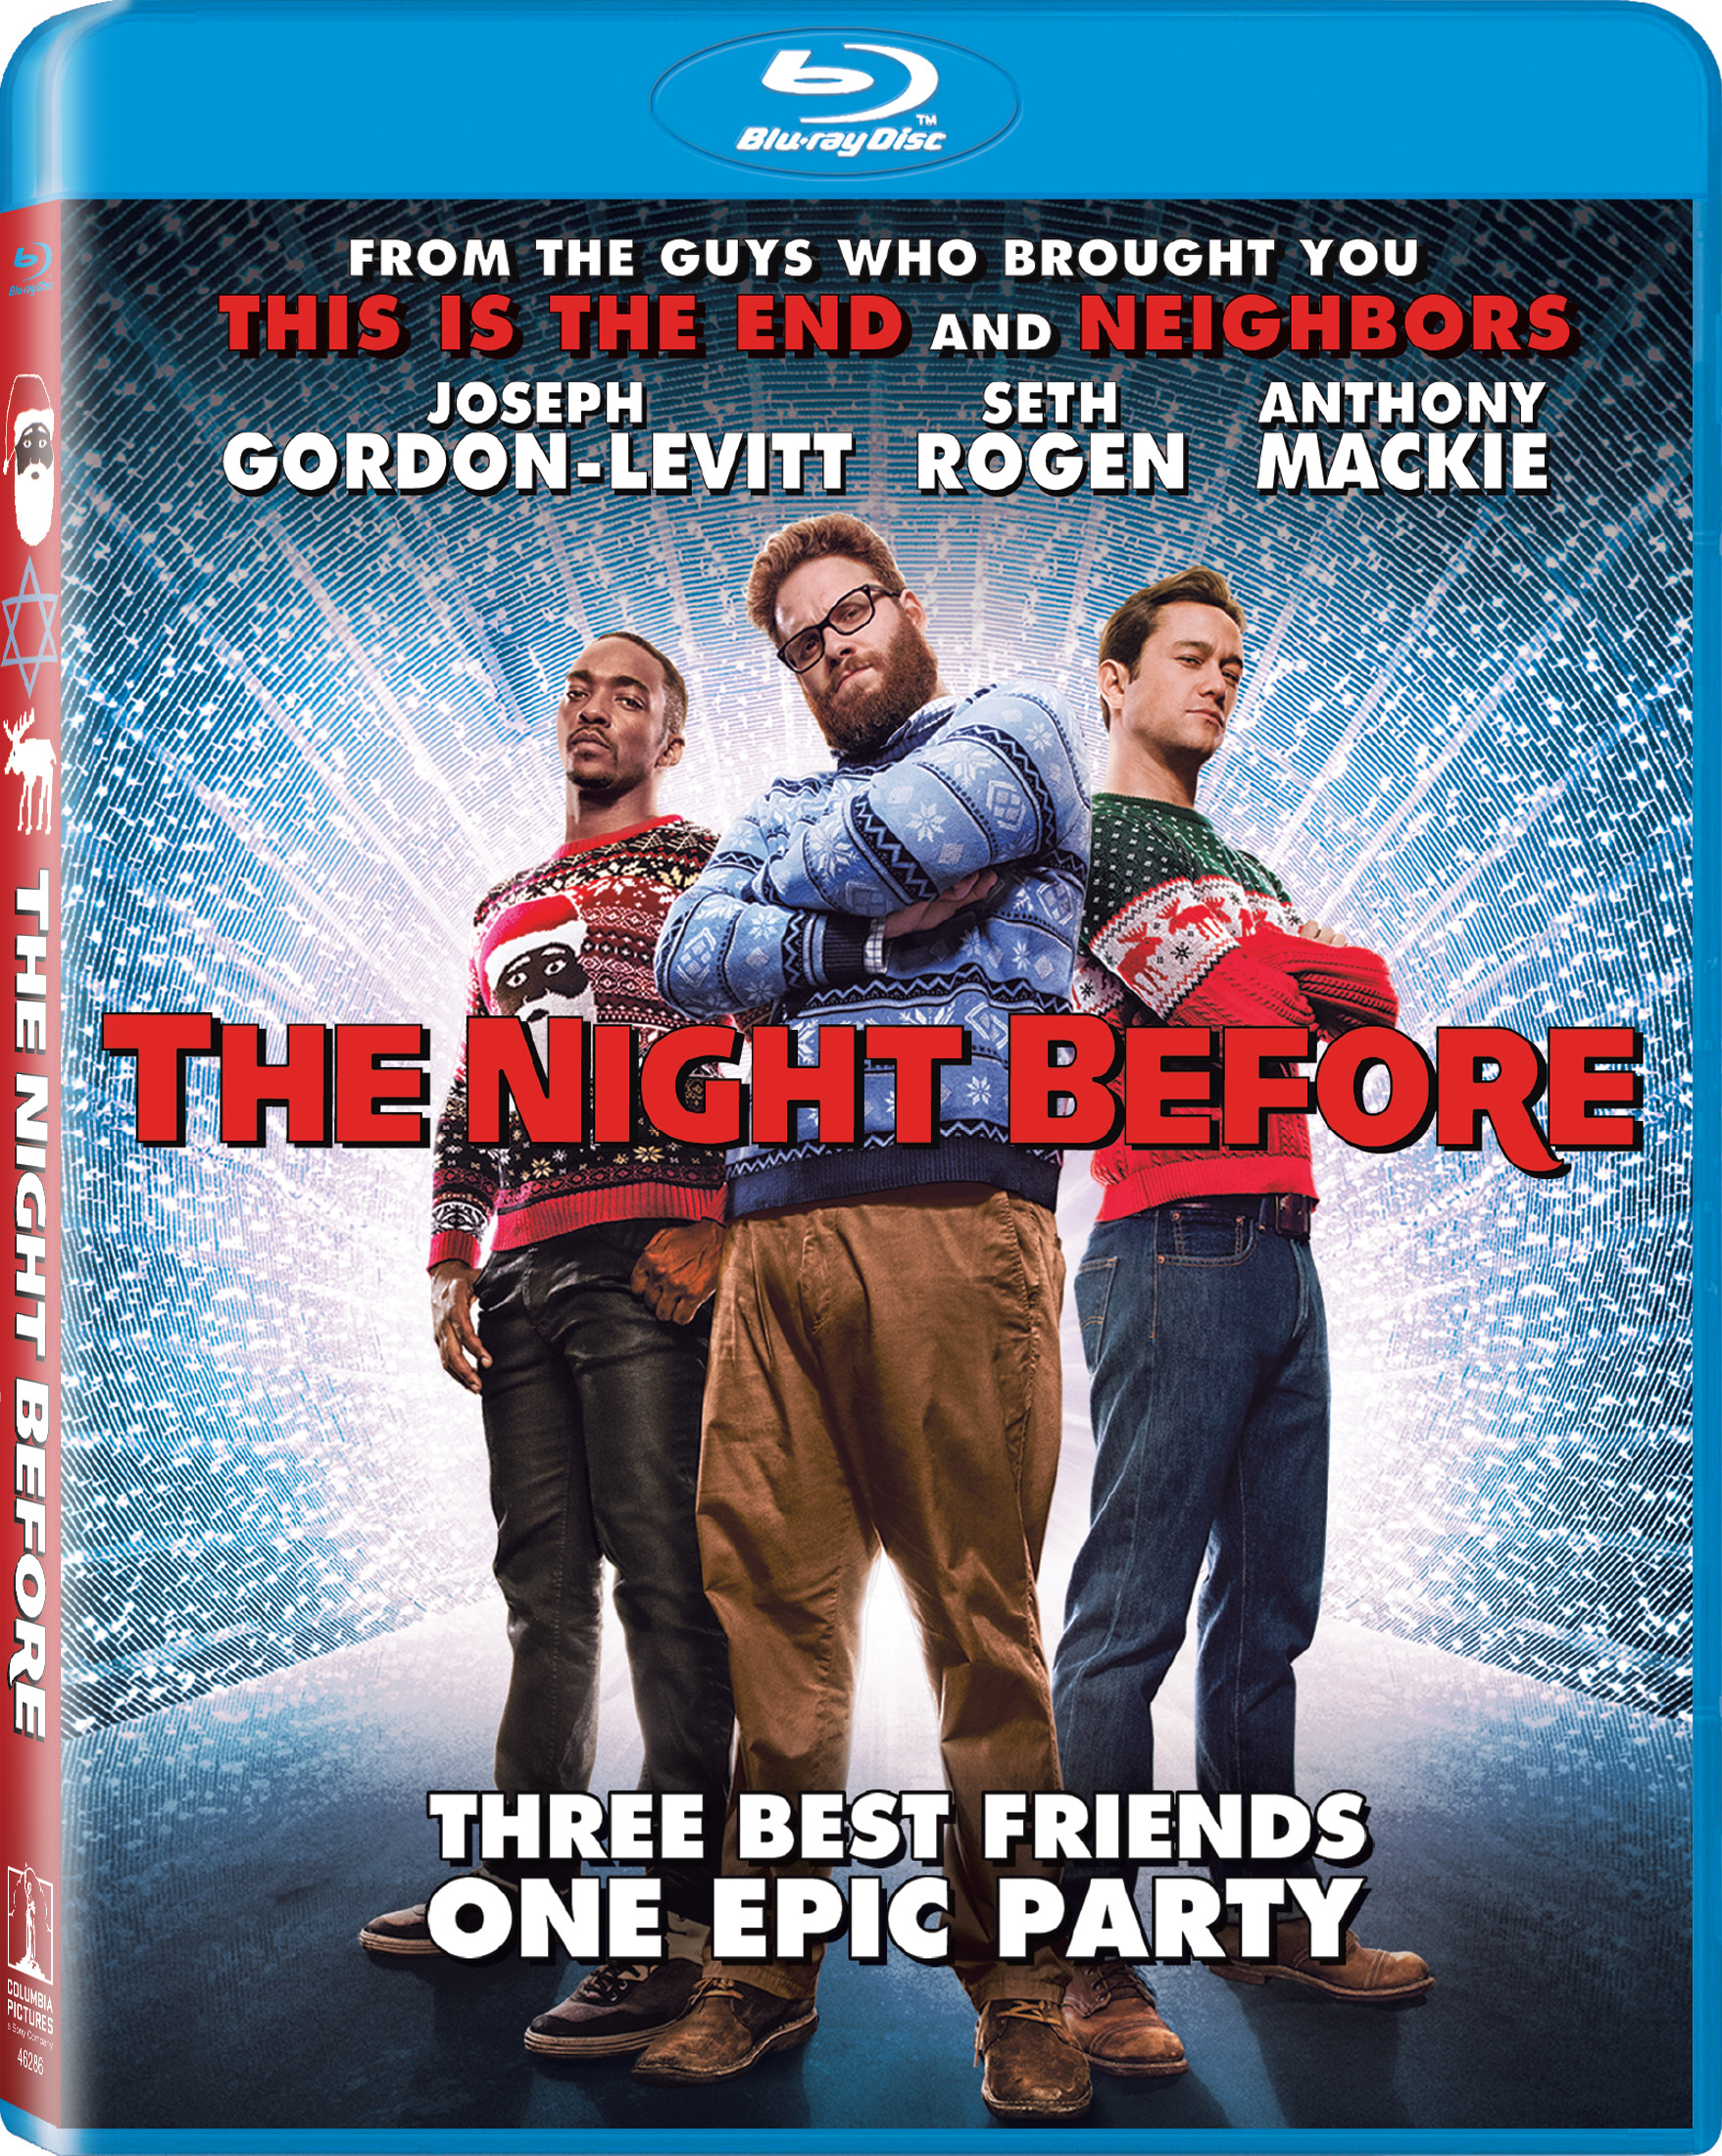 The Night Before (2015) Blu-ray